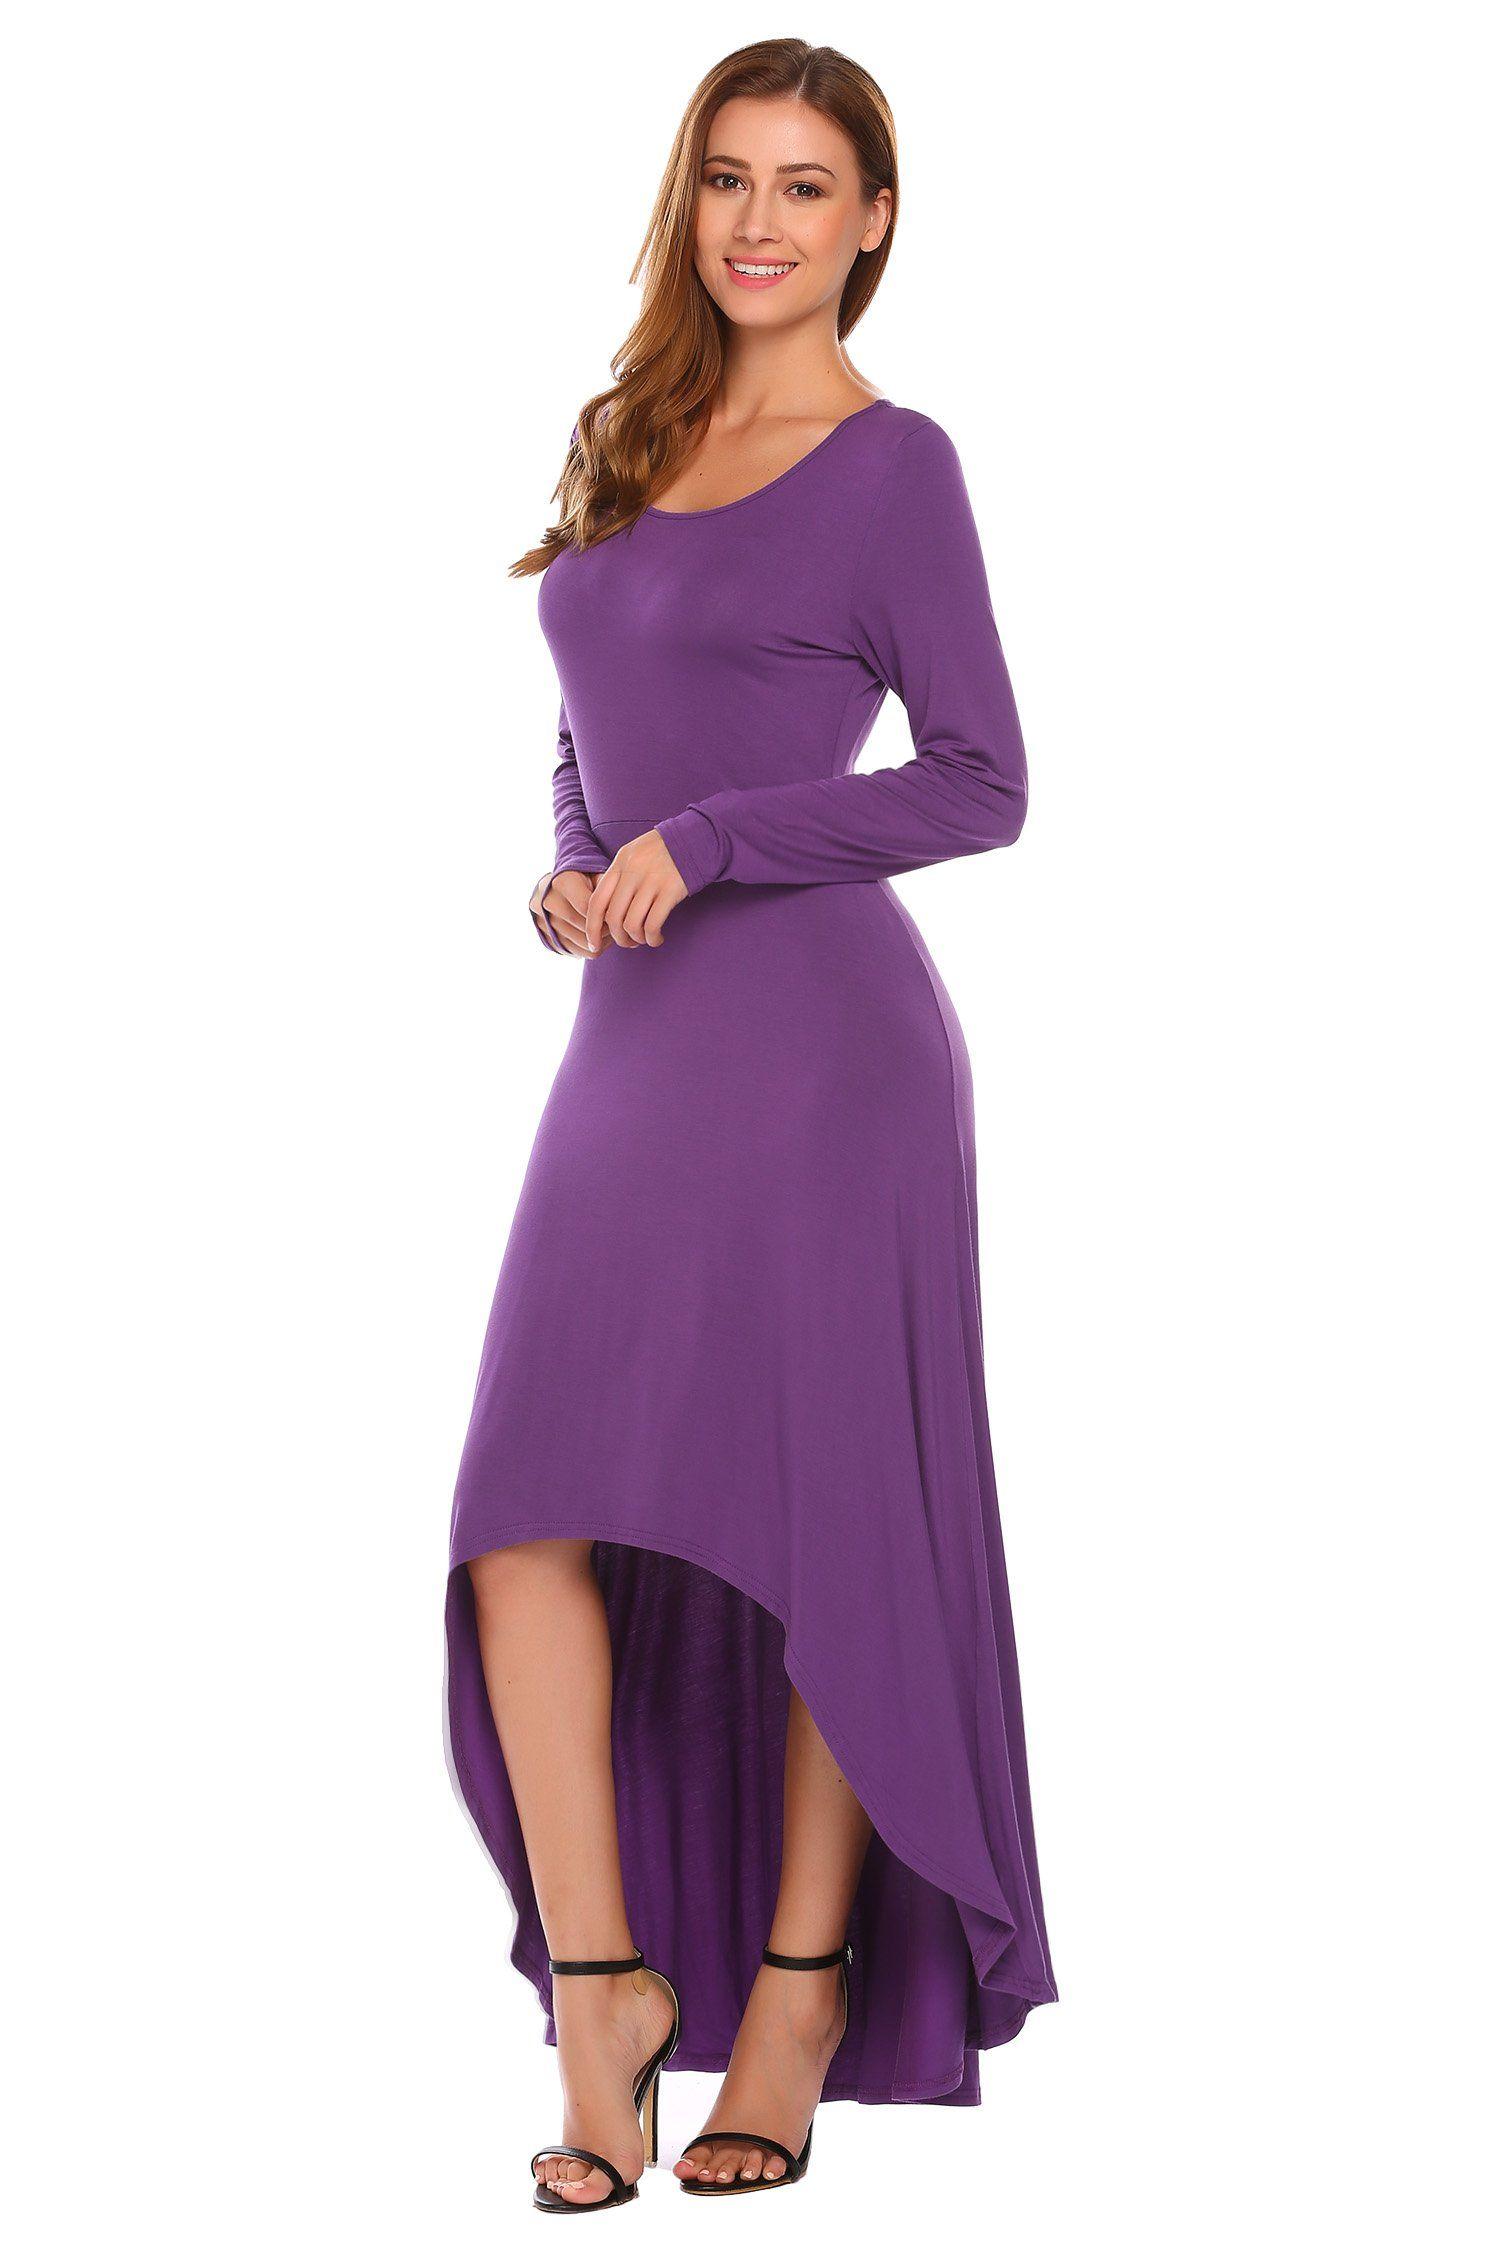 Maternity Outfits hardwearing maternity maxi dress Zeagoo